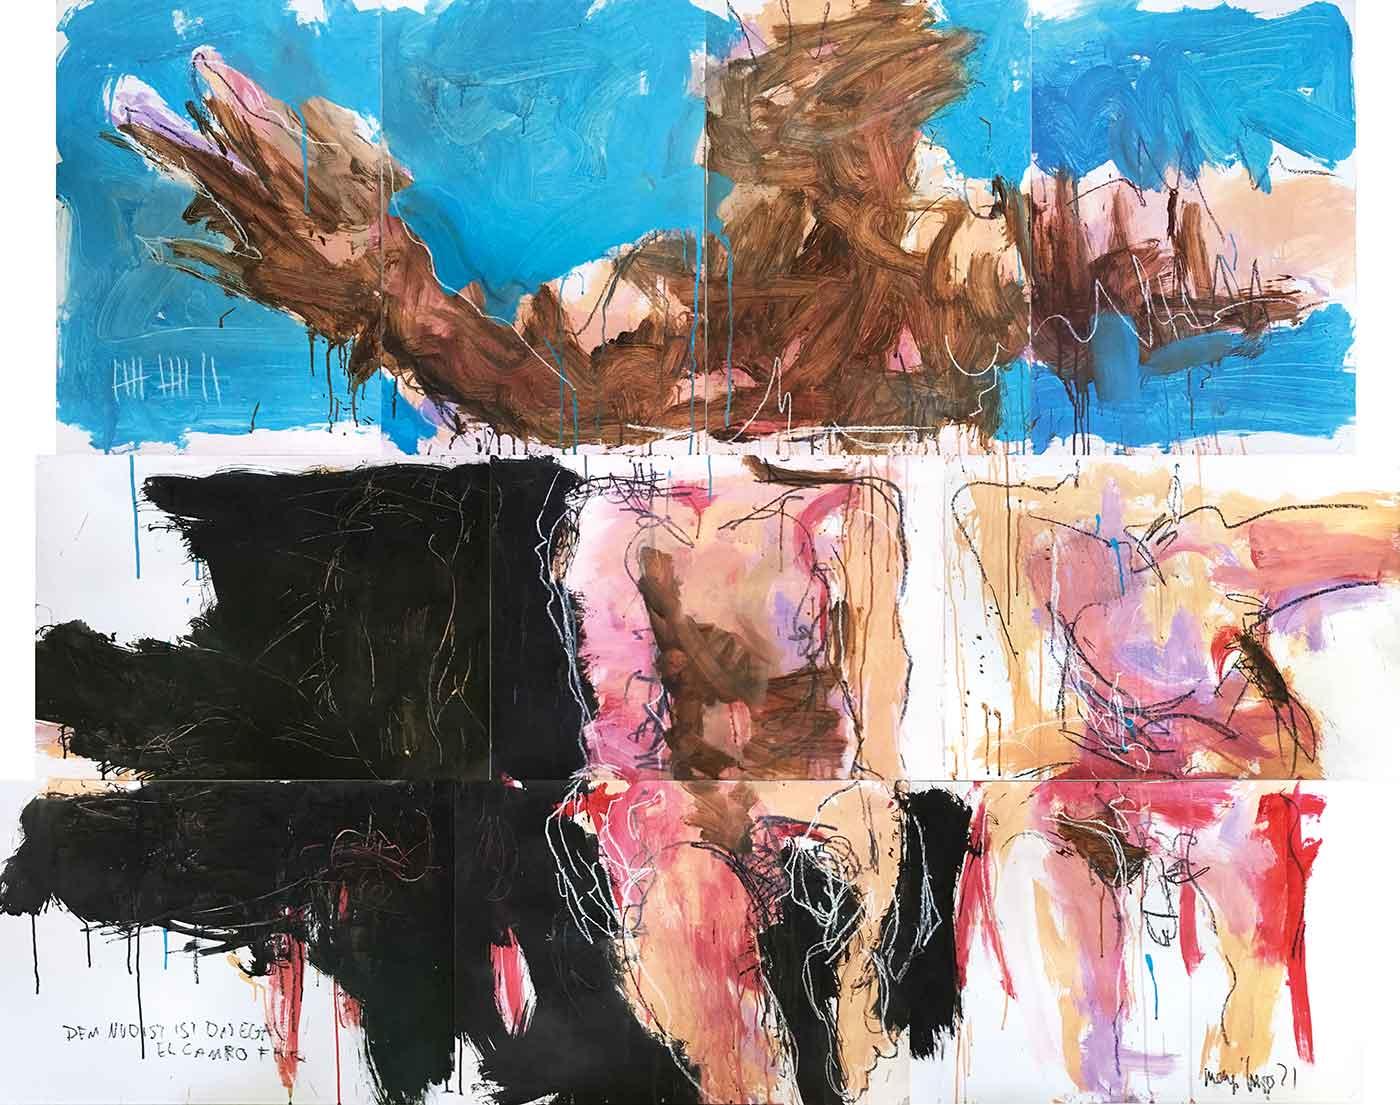 dem-nudist-ist-das-egal-mongi-higgs-kuenstler-el-campo-fkk-complete-web-konsum163-galerie-modern-art-gallery